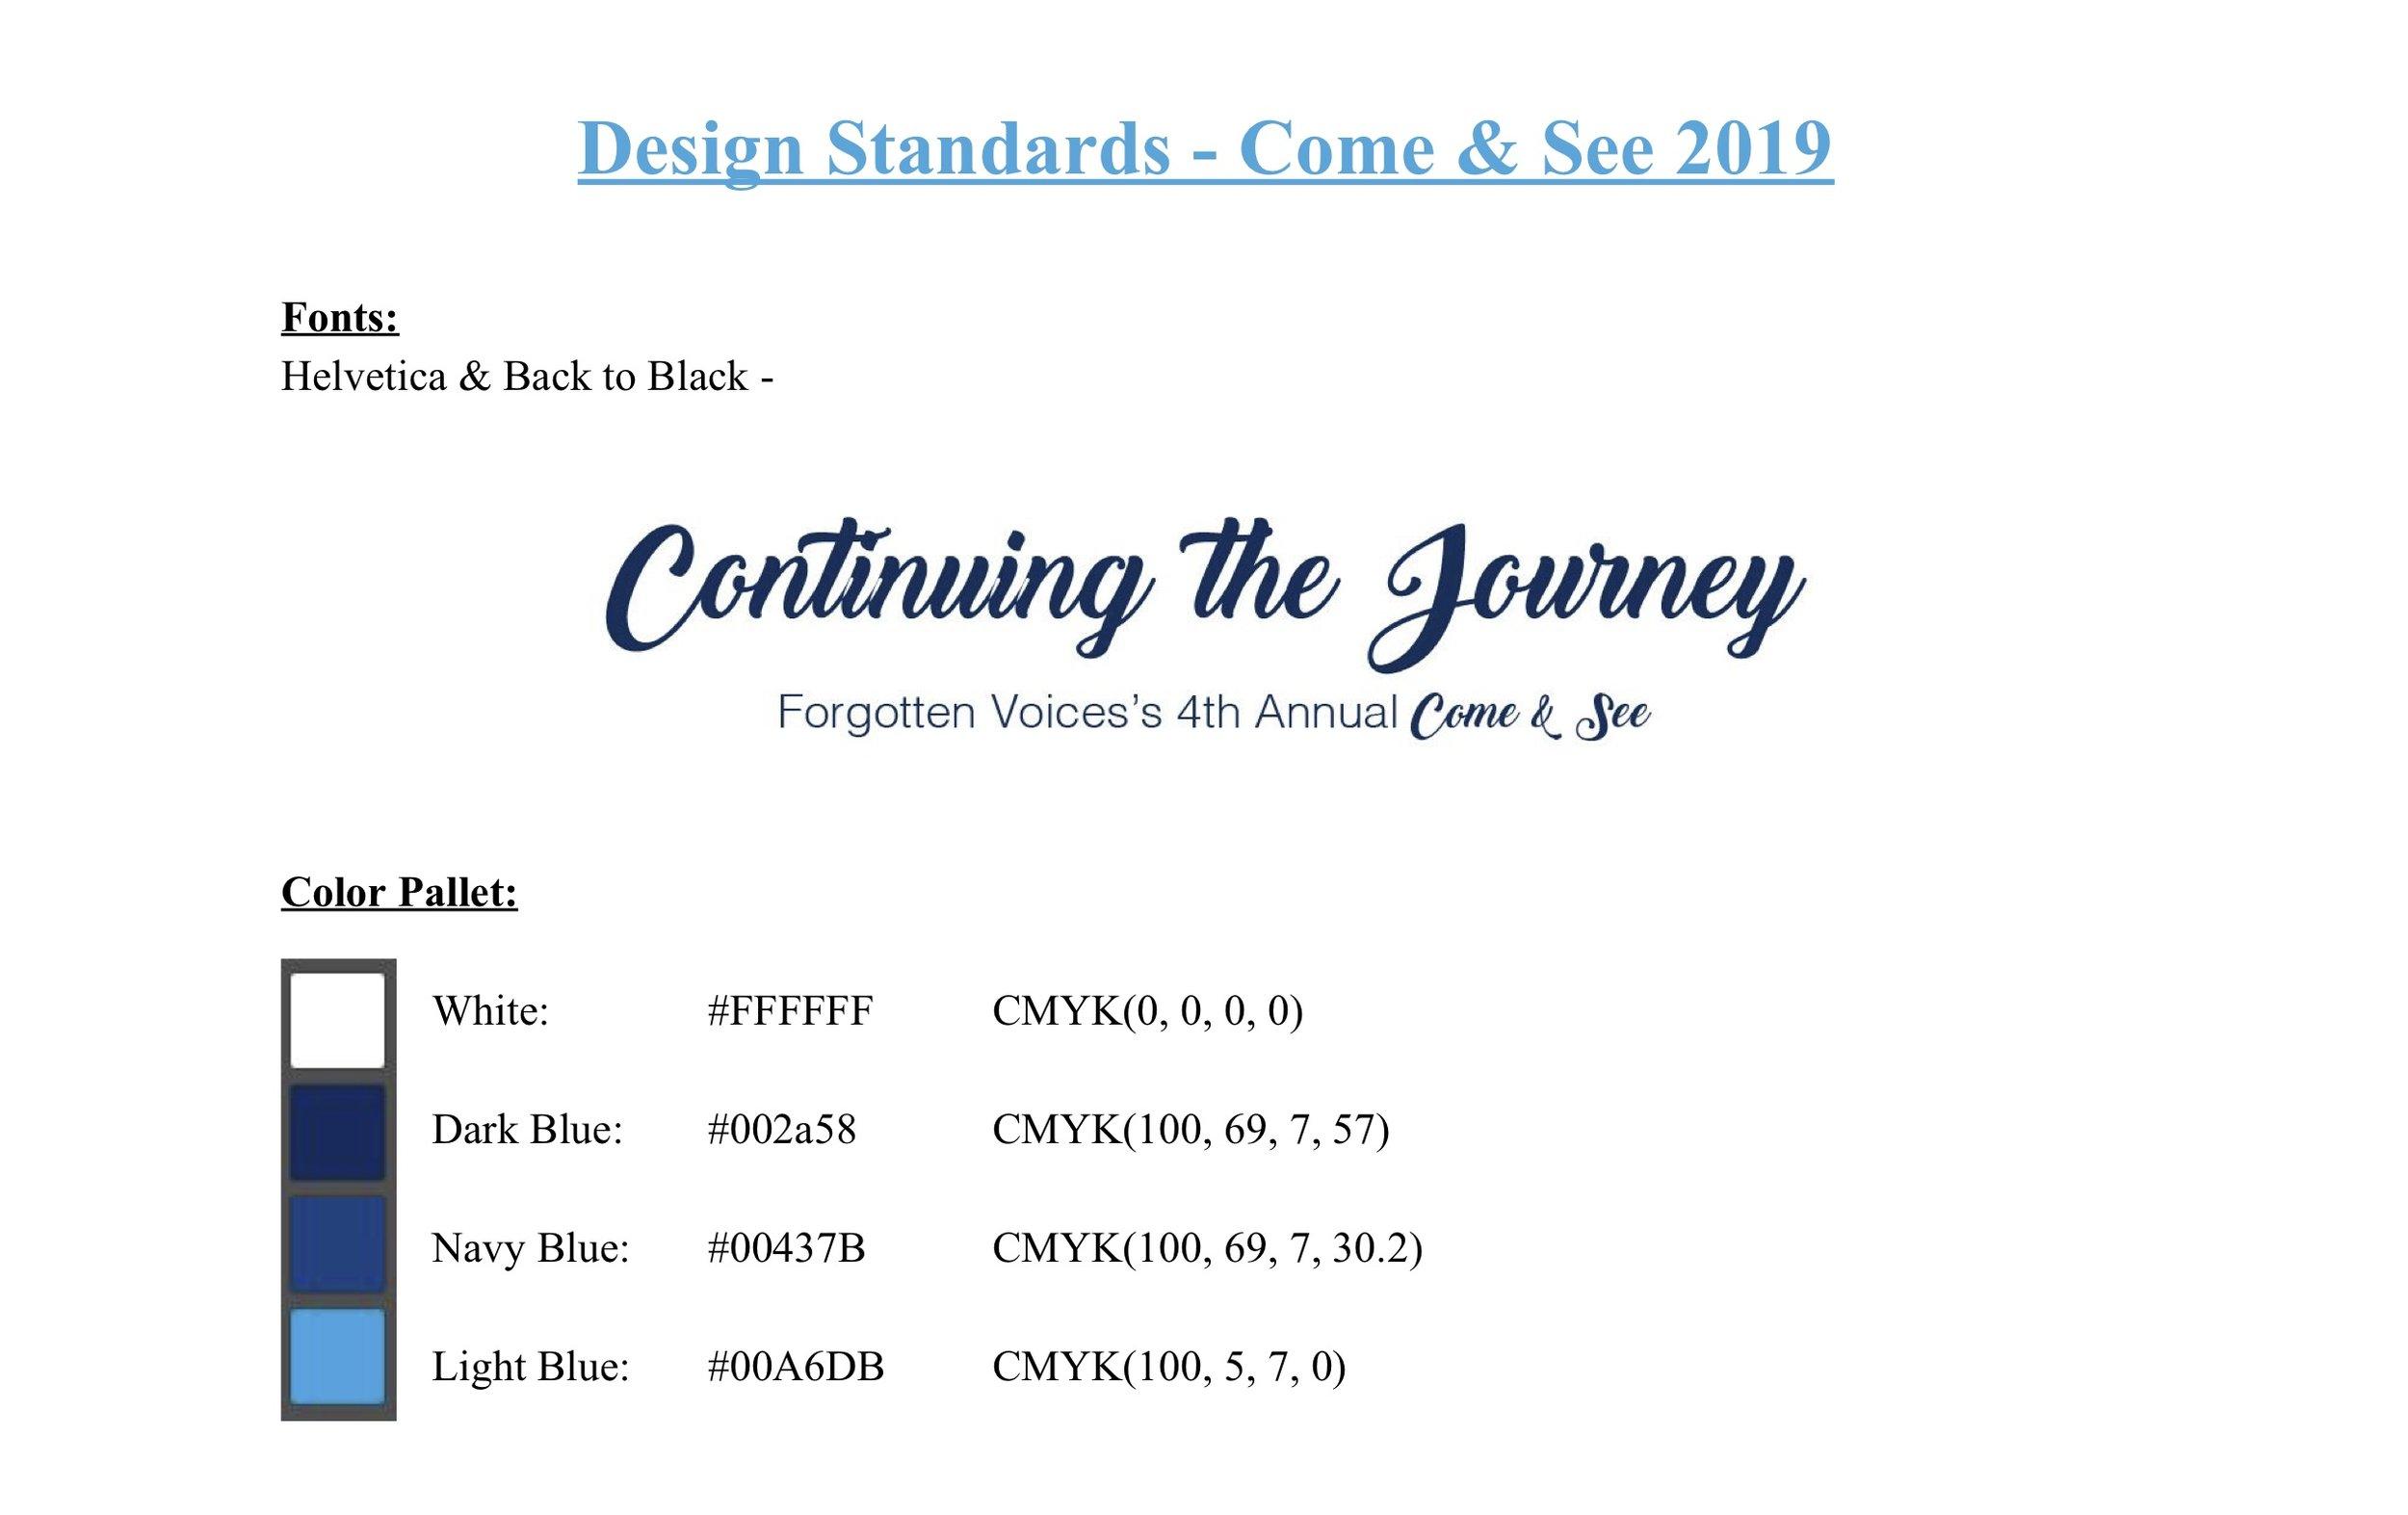 Come & See 2019 Design Standard.jpg